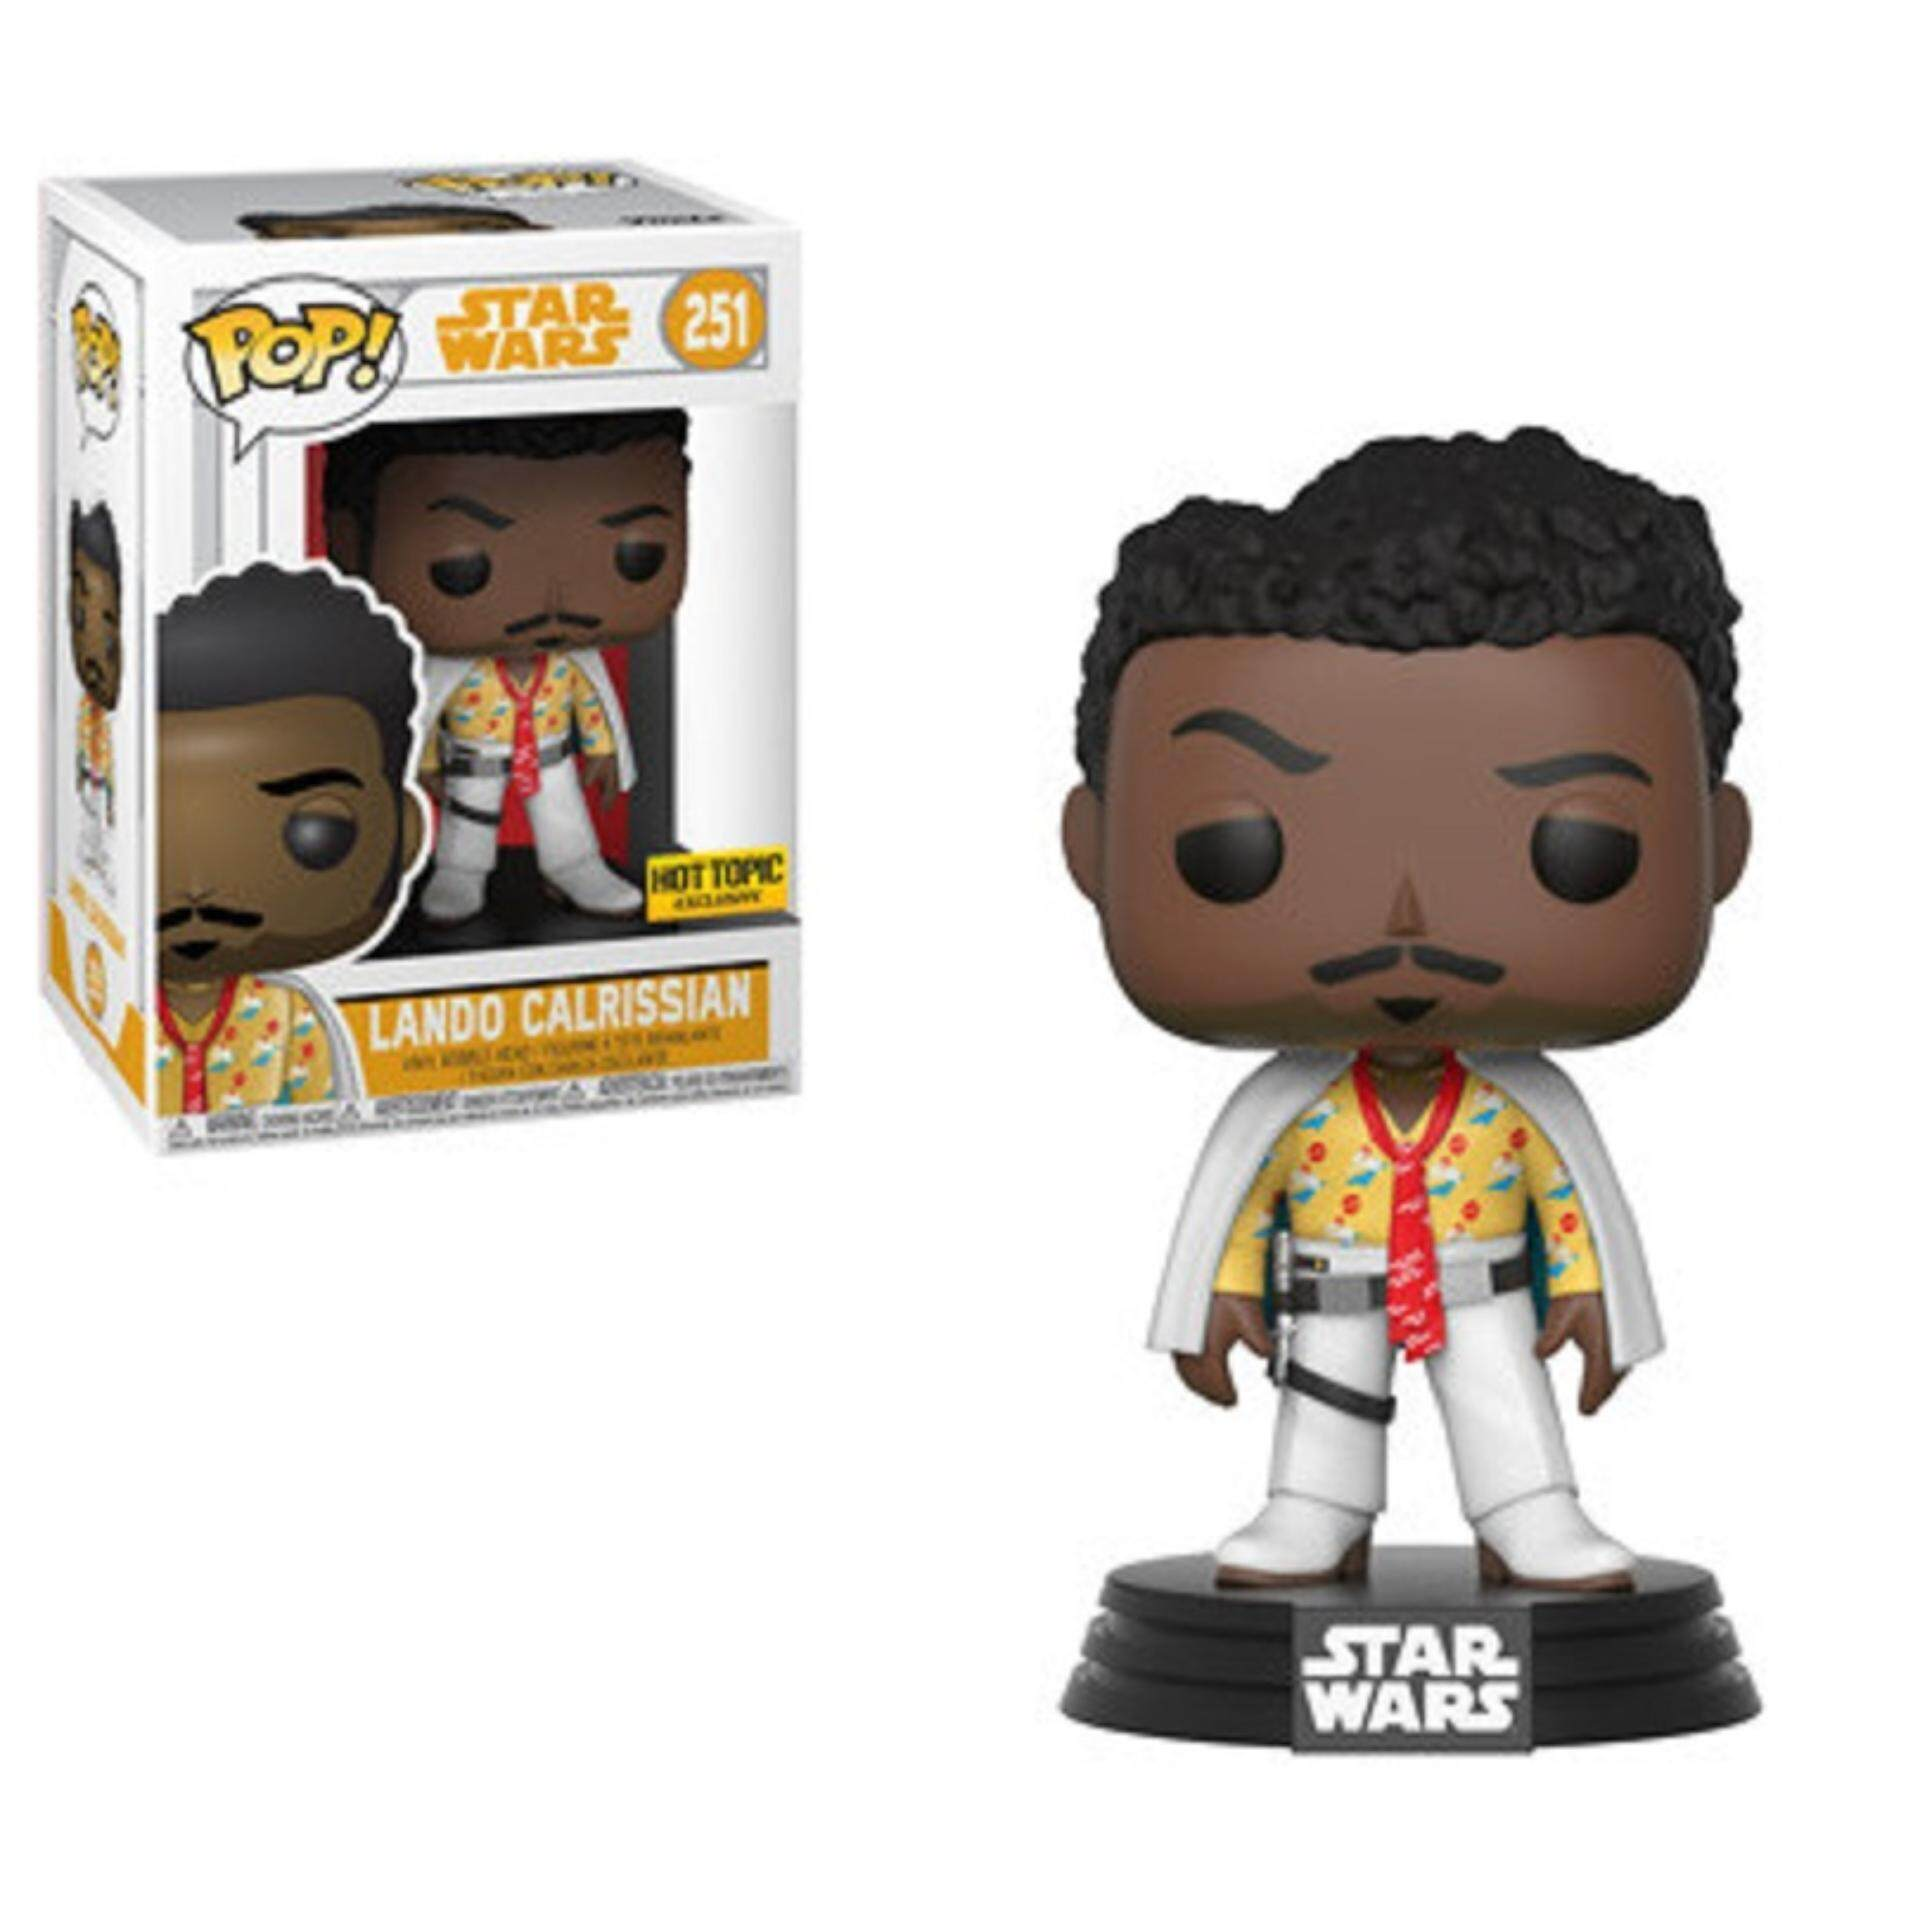 FUNKO POP! Star Wars Solo Exclusive Figure - Lando Calrissian Toys for boys